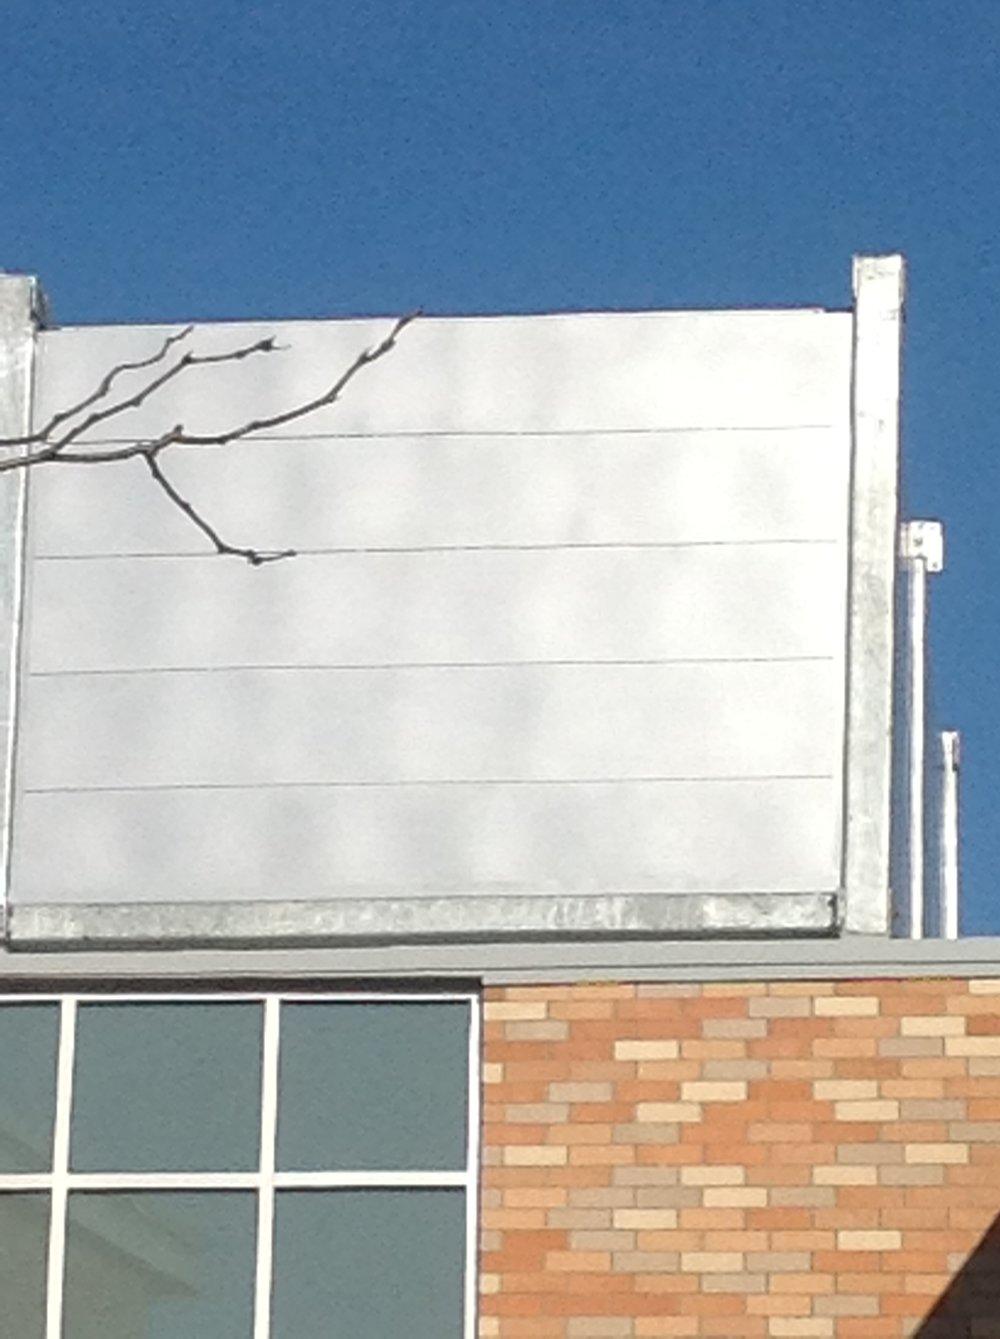 Stevenson Elementary School, IL